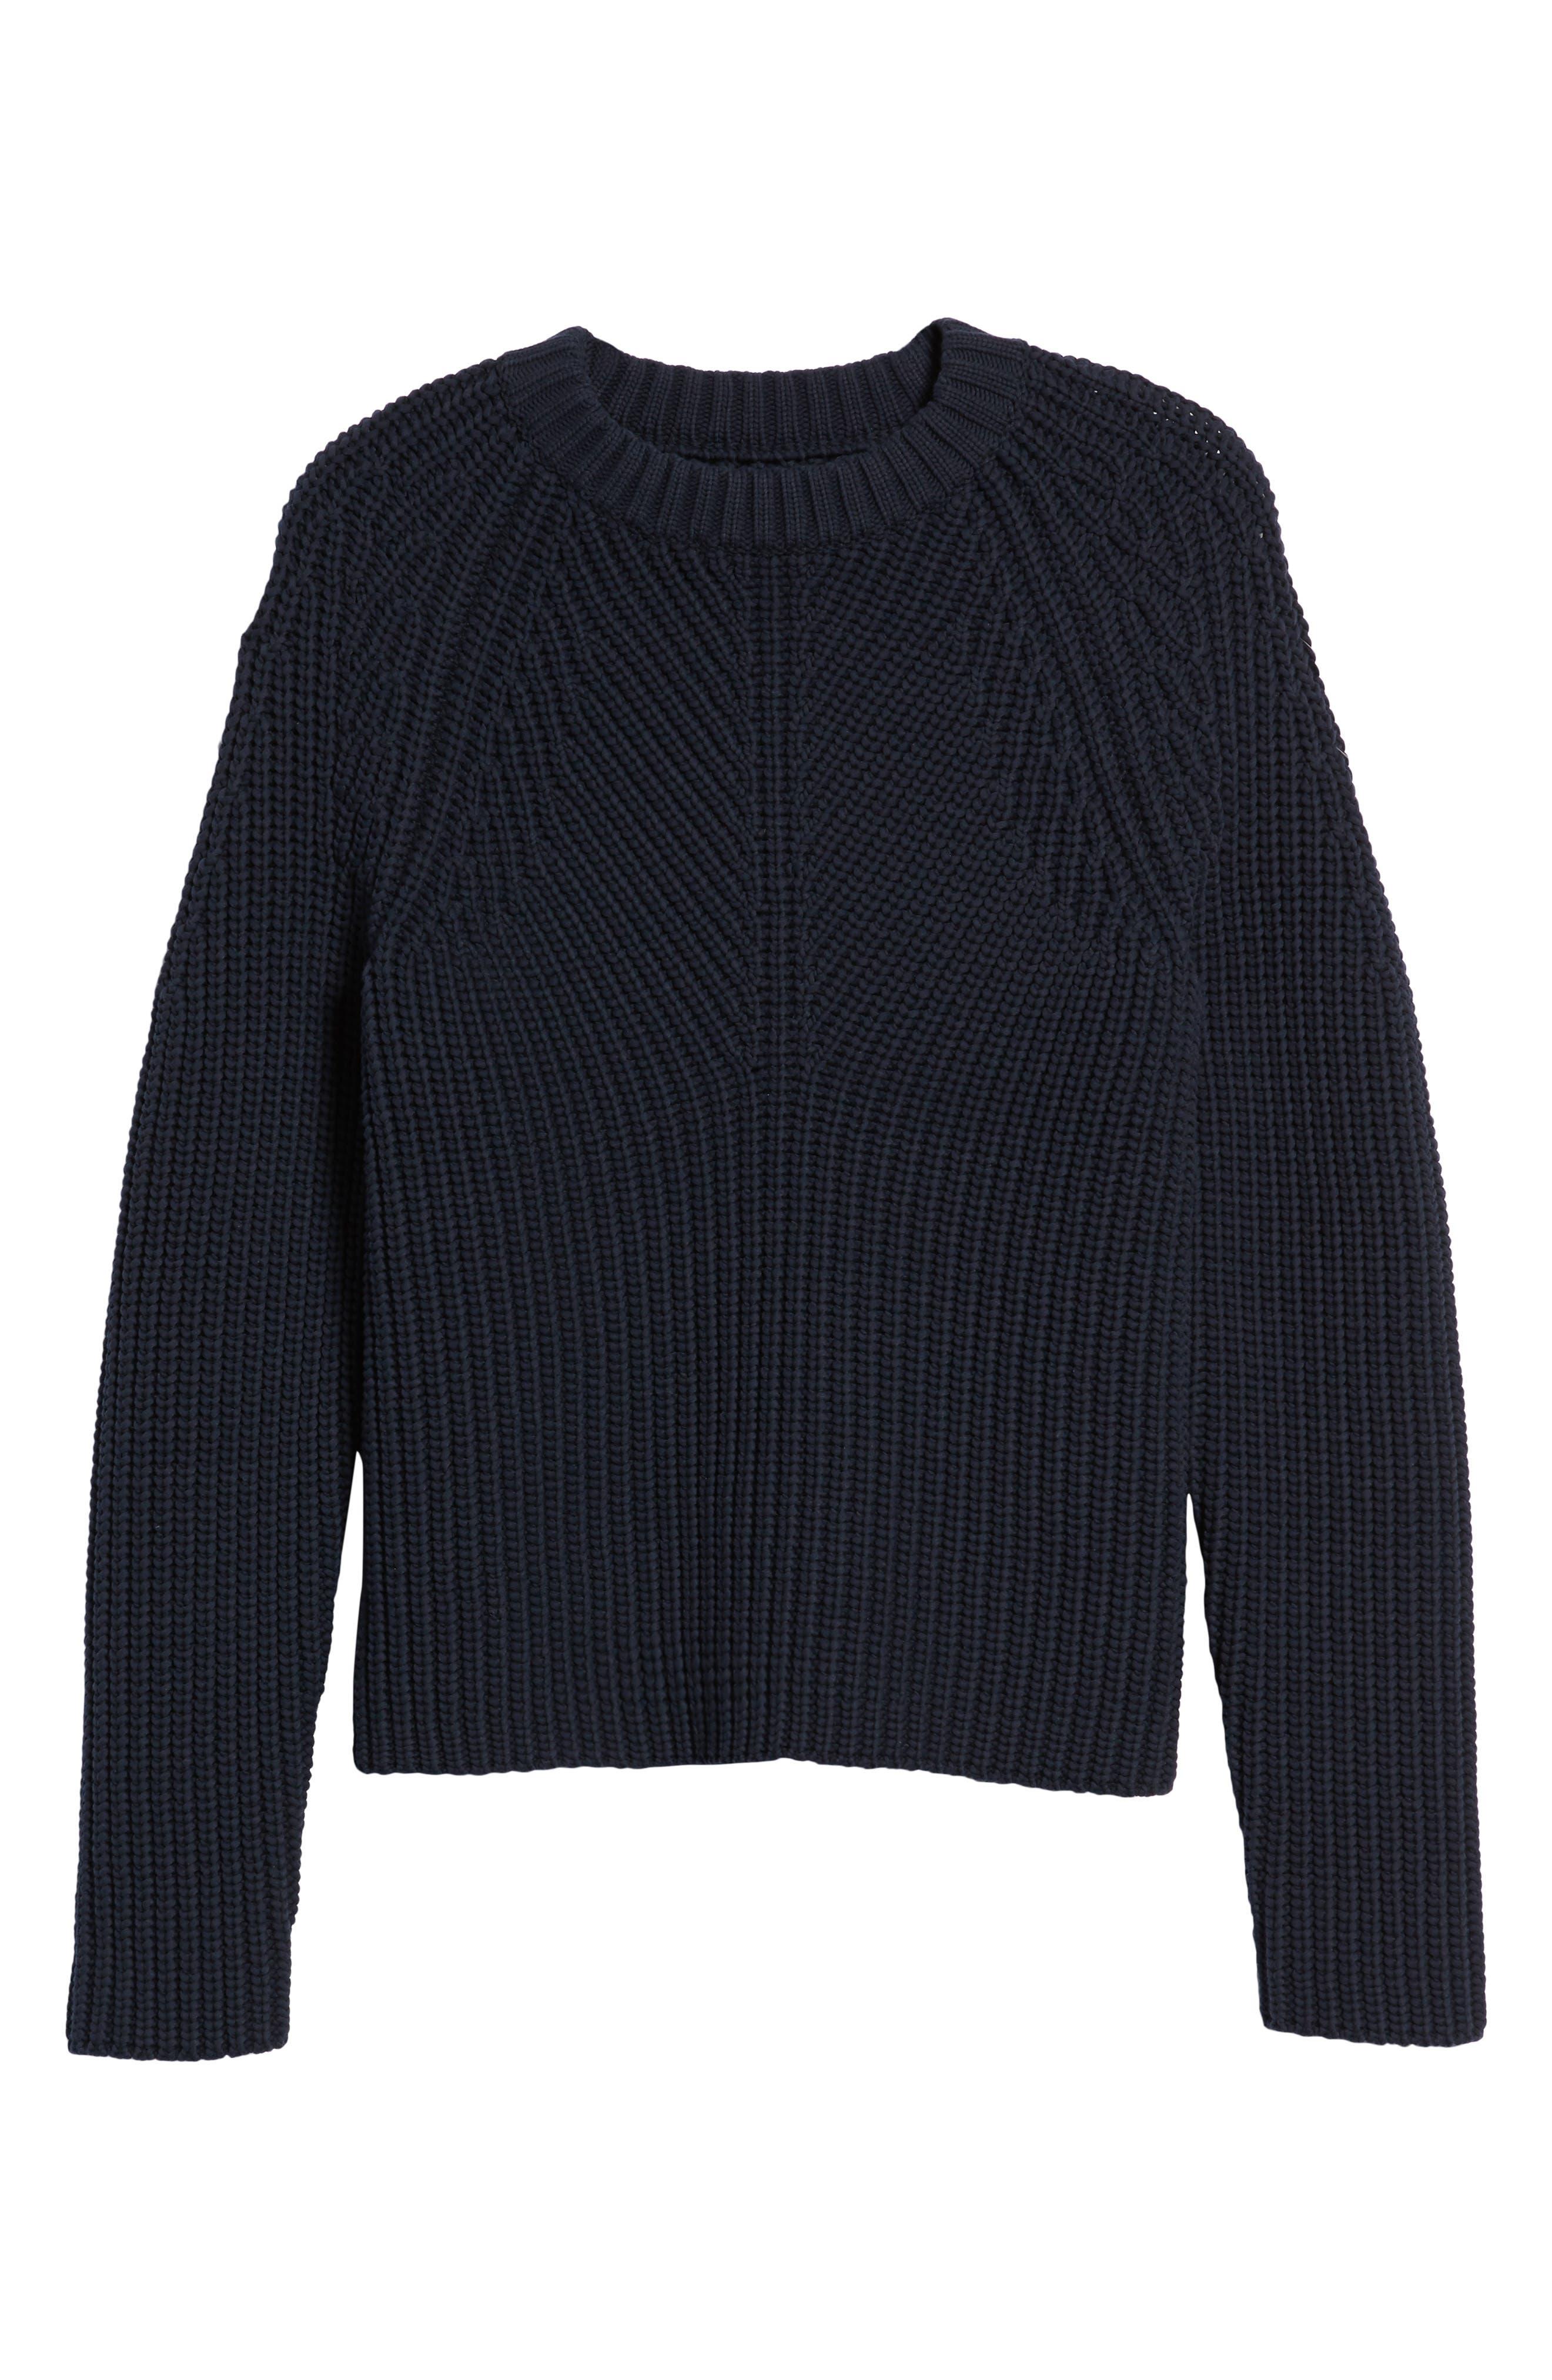 Raglan Sleeve Knit Sweater,                             Alternate thumbnail 6, color,                             Navy Night